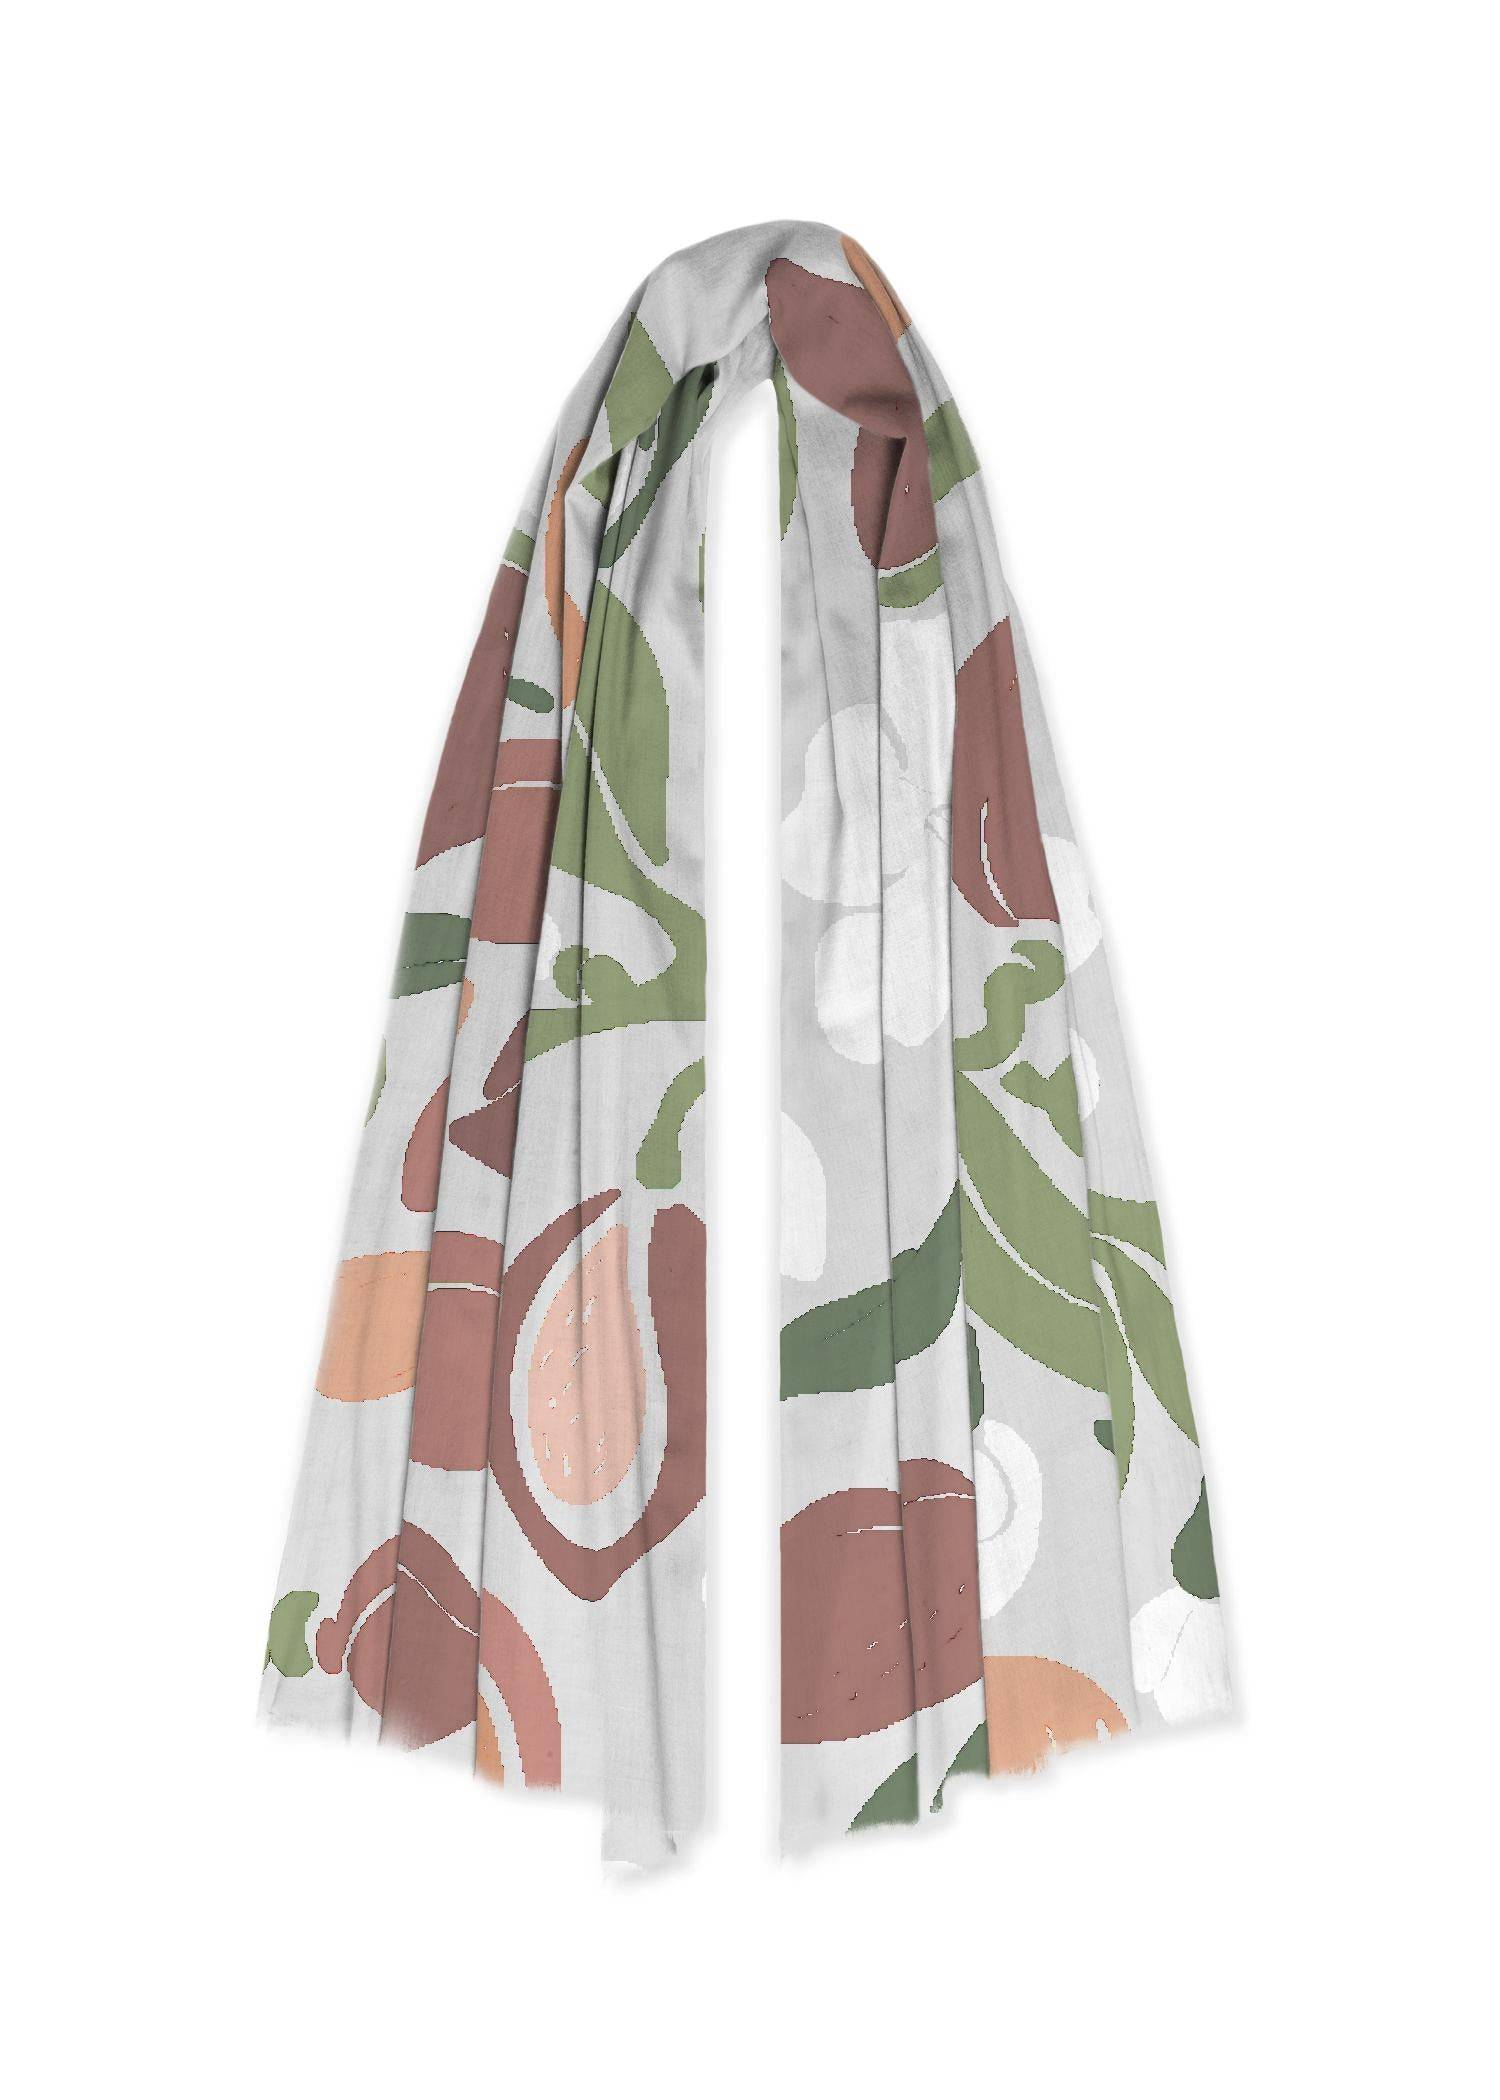 VIDA 100% Cashmere Scarf - Vintage Fashion Floral Ar in Brown/White by VIDA Original Artist  - Size: One Size